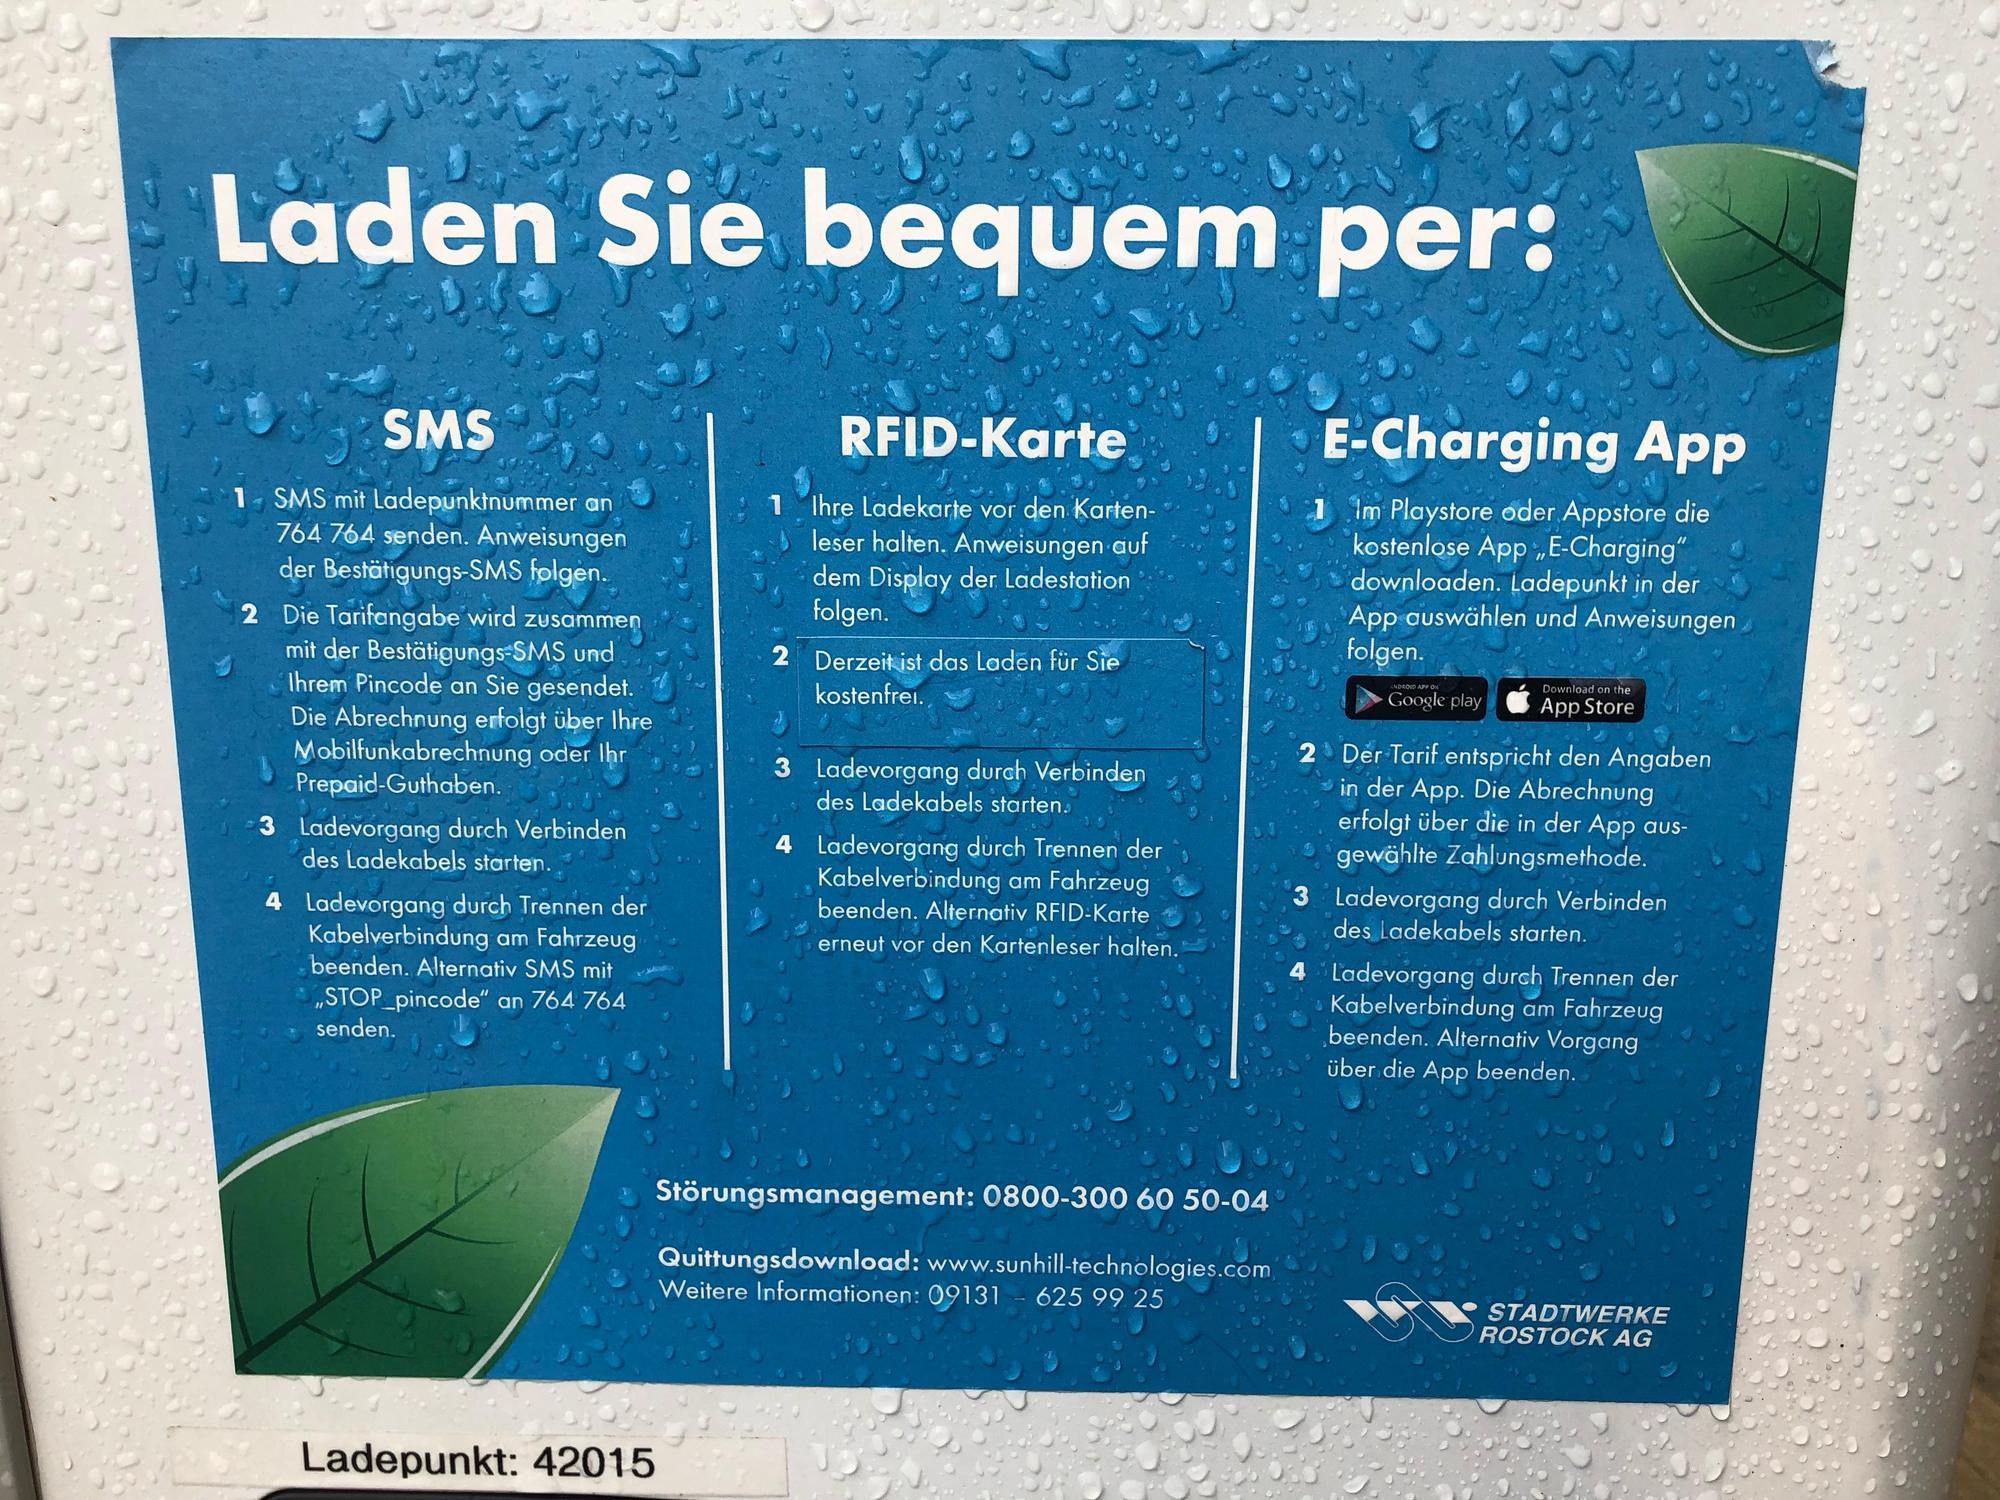 Playstore Karte.Charging Station Stadtwerke Rostock Ag Plugshare